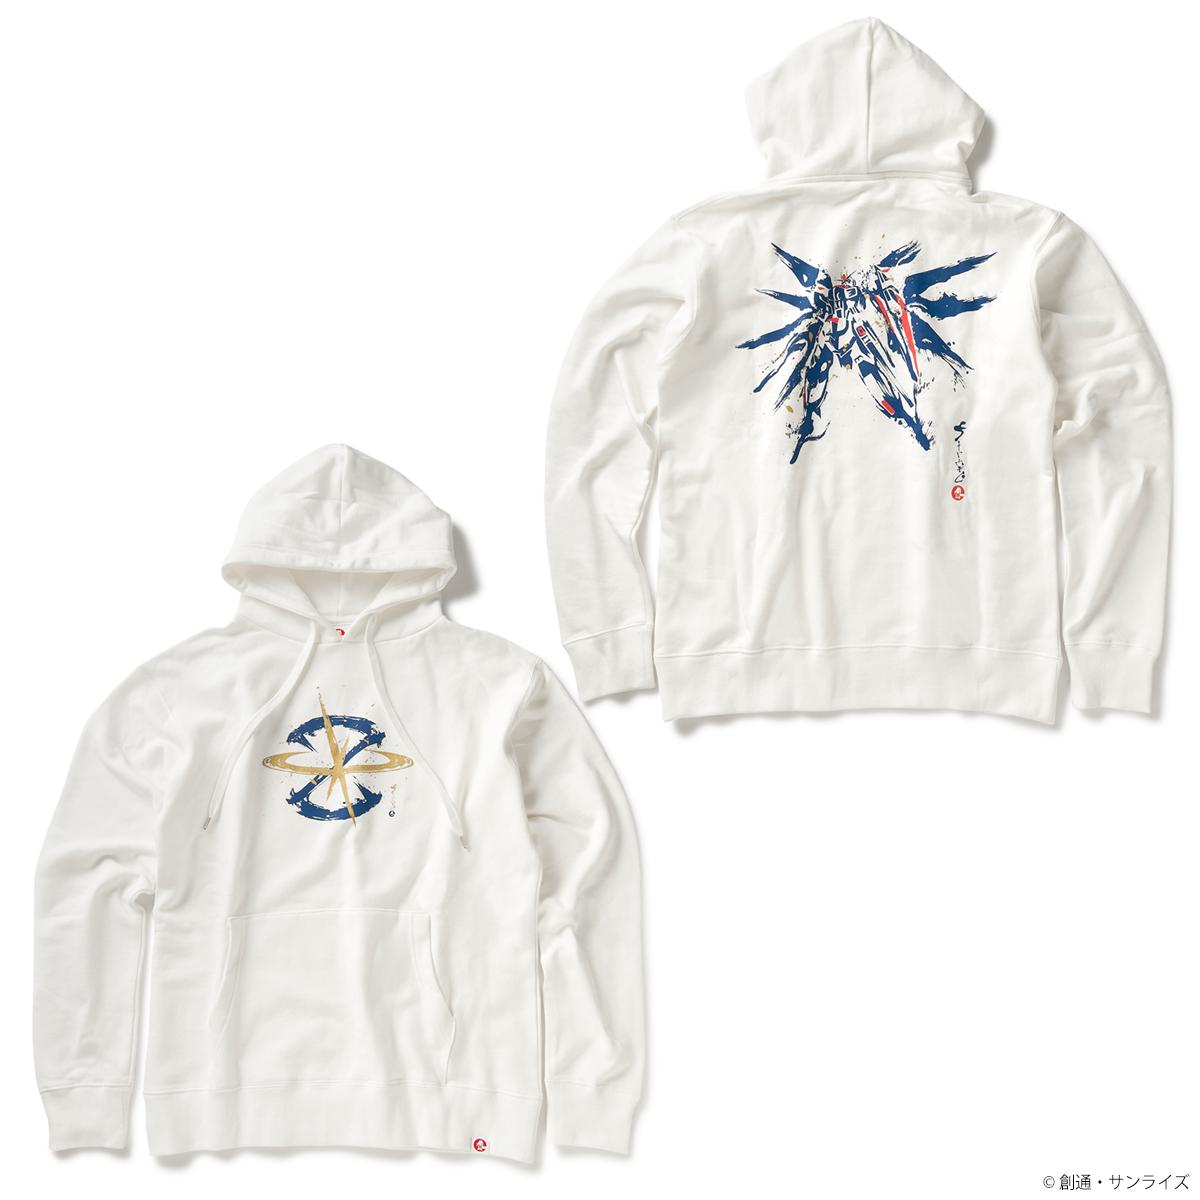 STRICT-G JAPAN 『機動戦士ガンダムSEED』 パーカー 筆絵風フリーダムガンダム柄